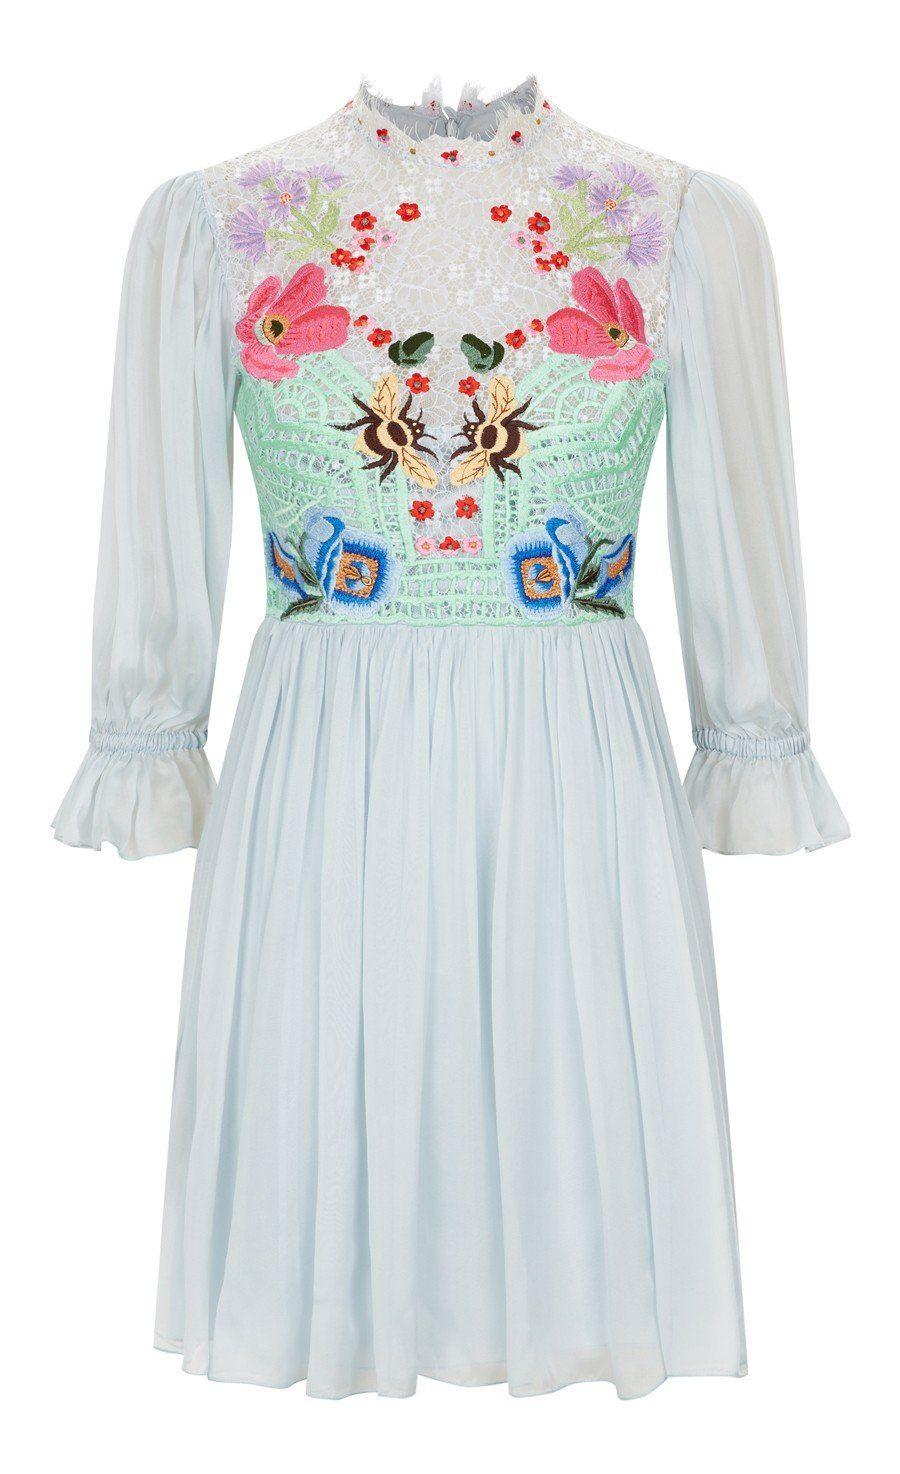 Mini aura lace sleeved dress spring distinctly flirty and